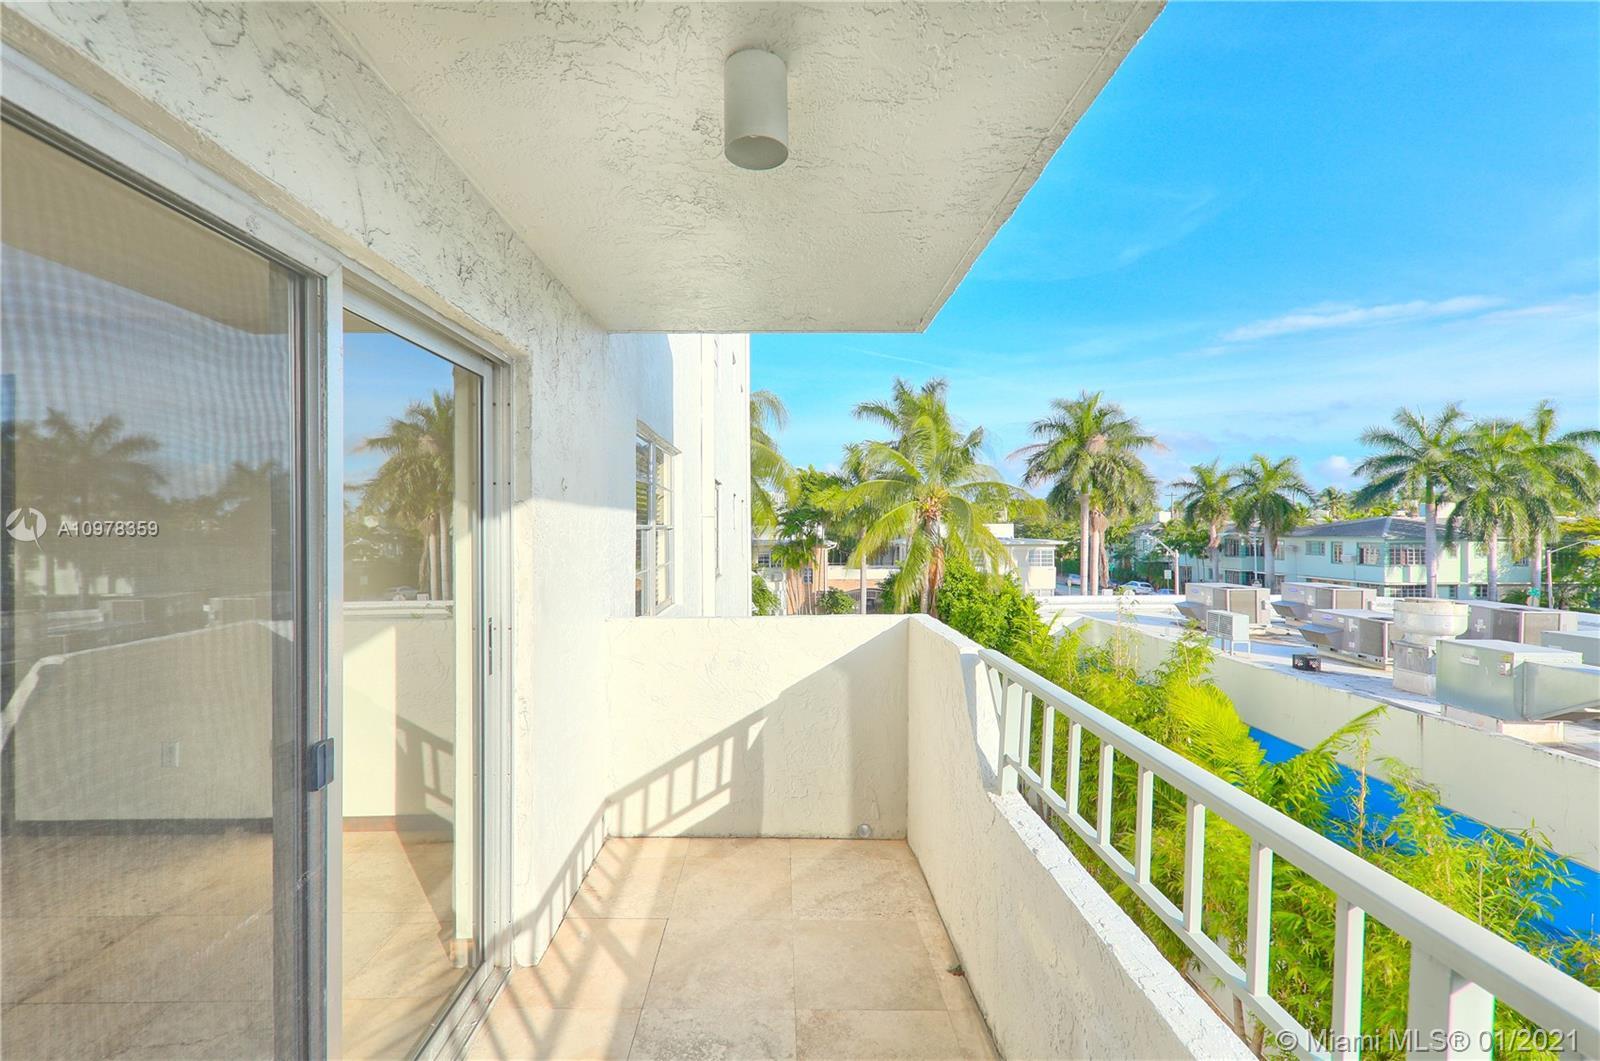 1610 Lenox ave-317 miami-beach-fl-33139-a10978359-Pic01